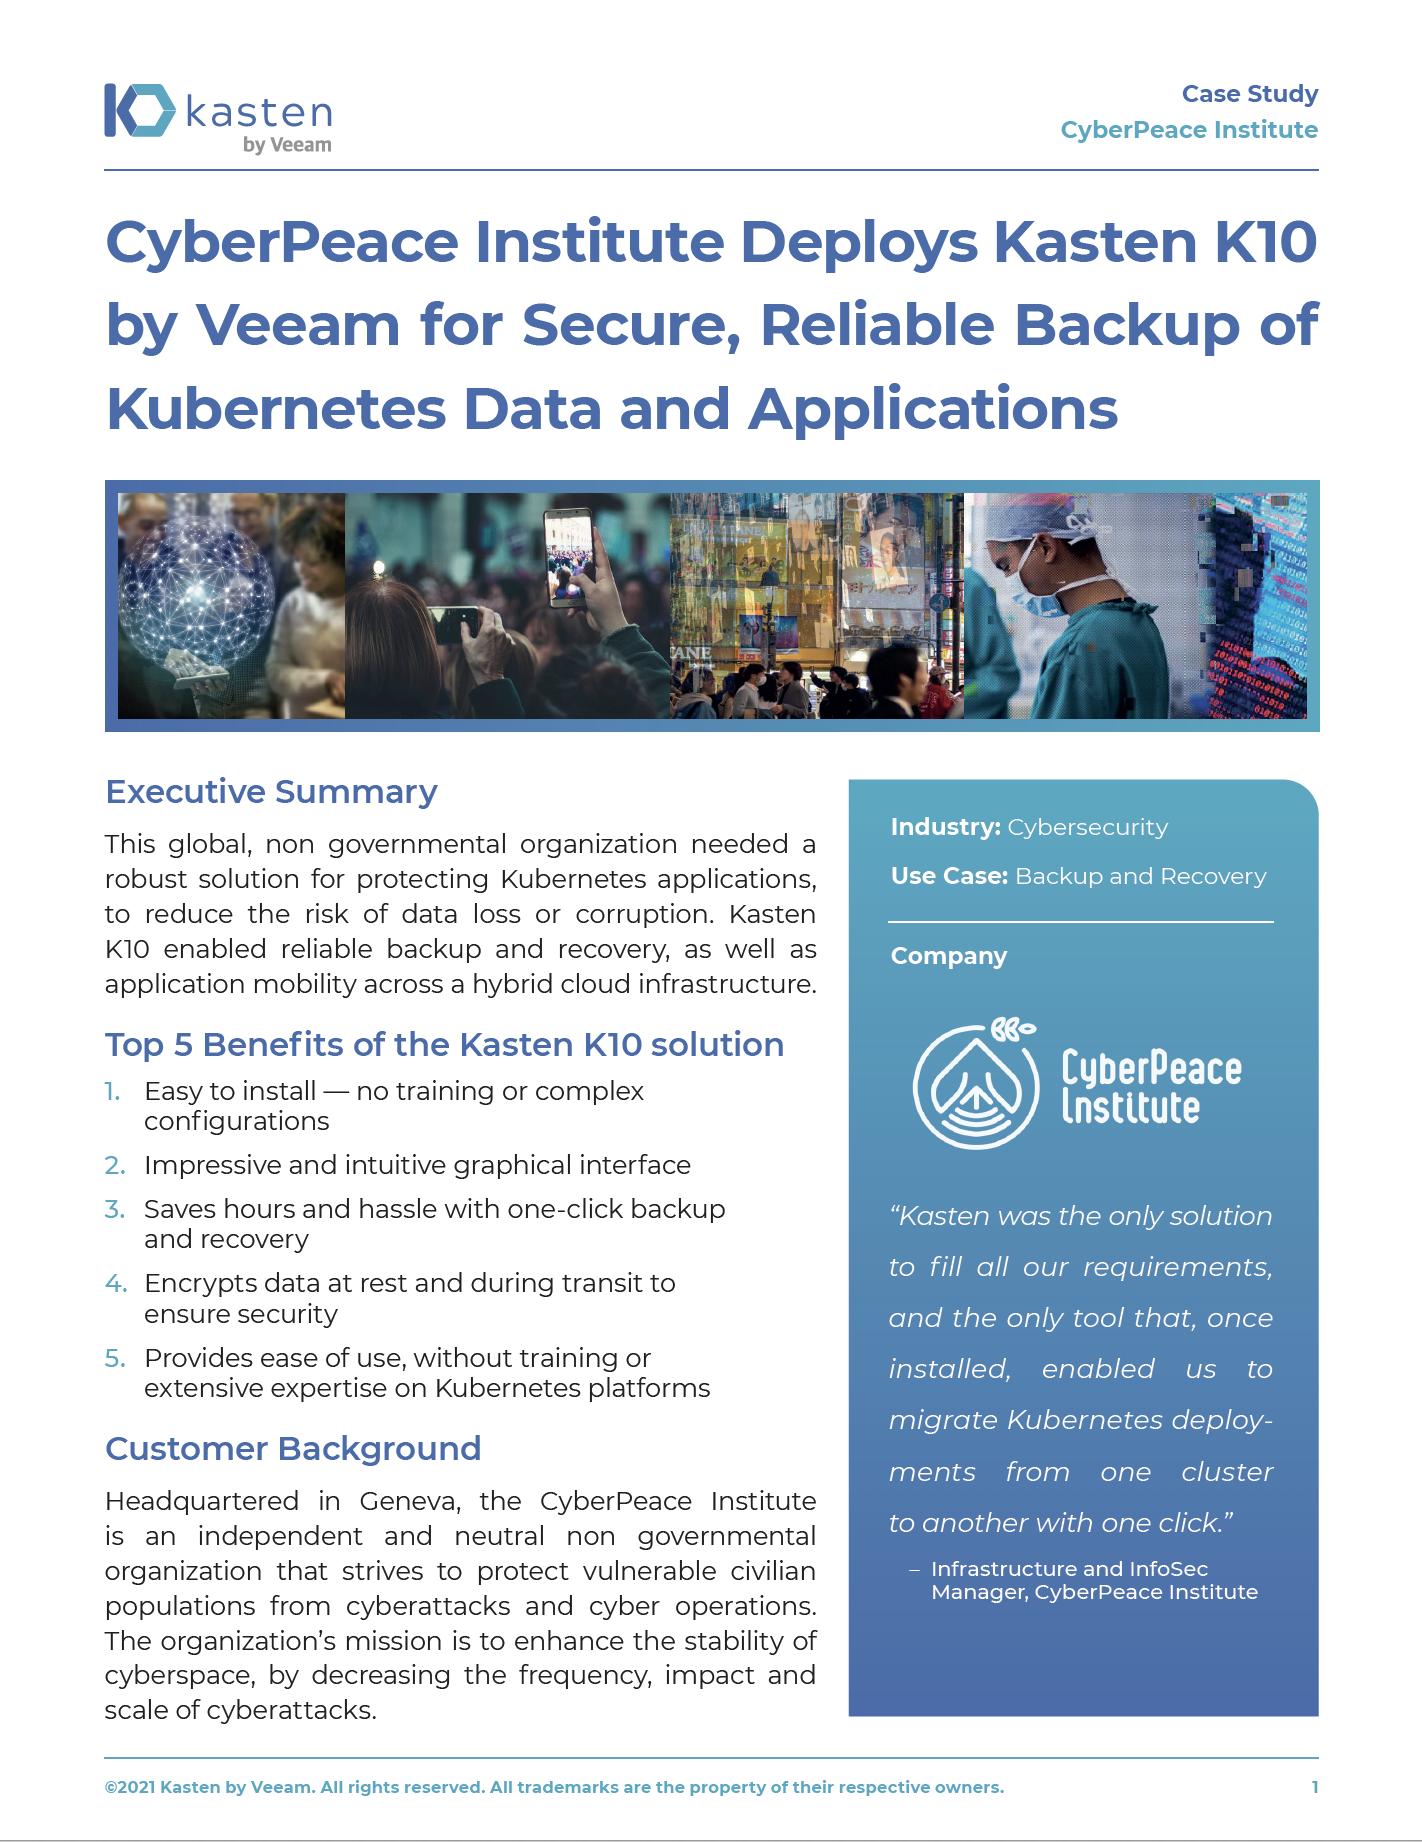 Kasten_Case_Study_Cyber_Peace_Institute_cover